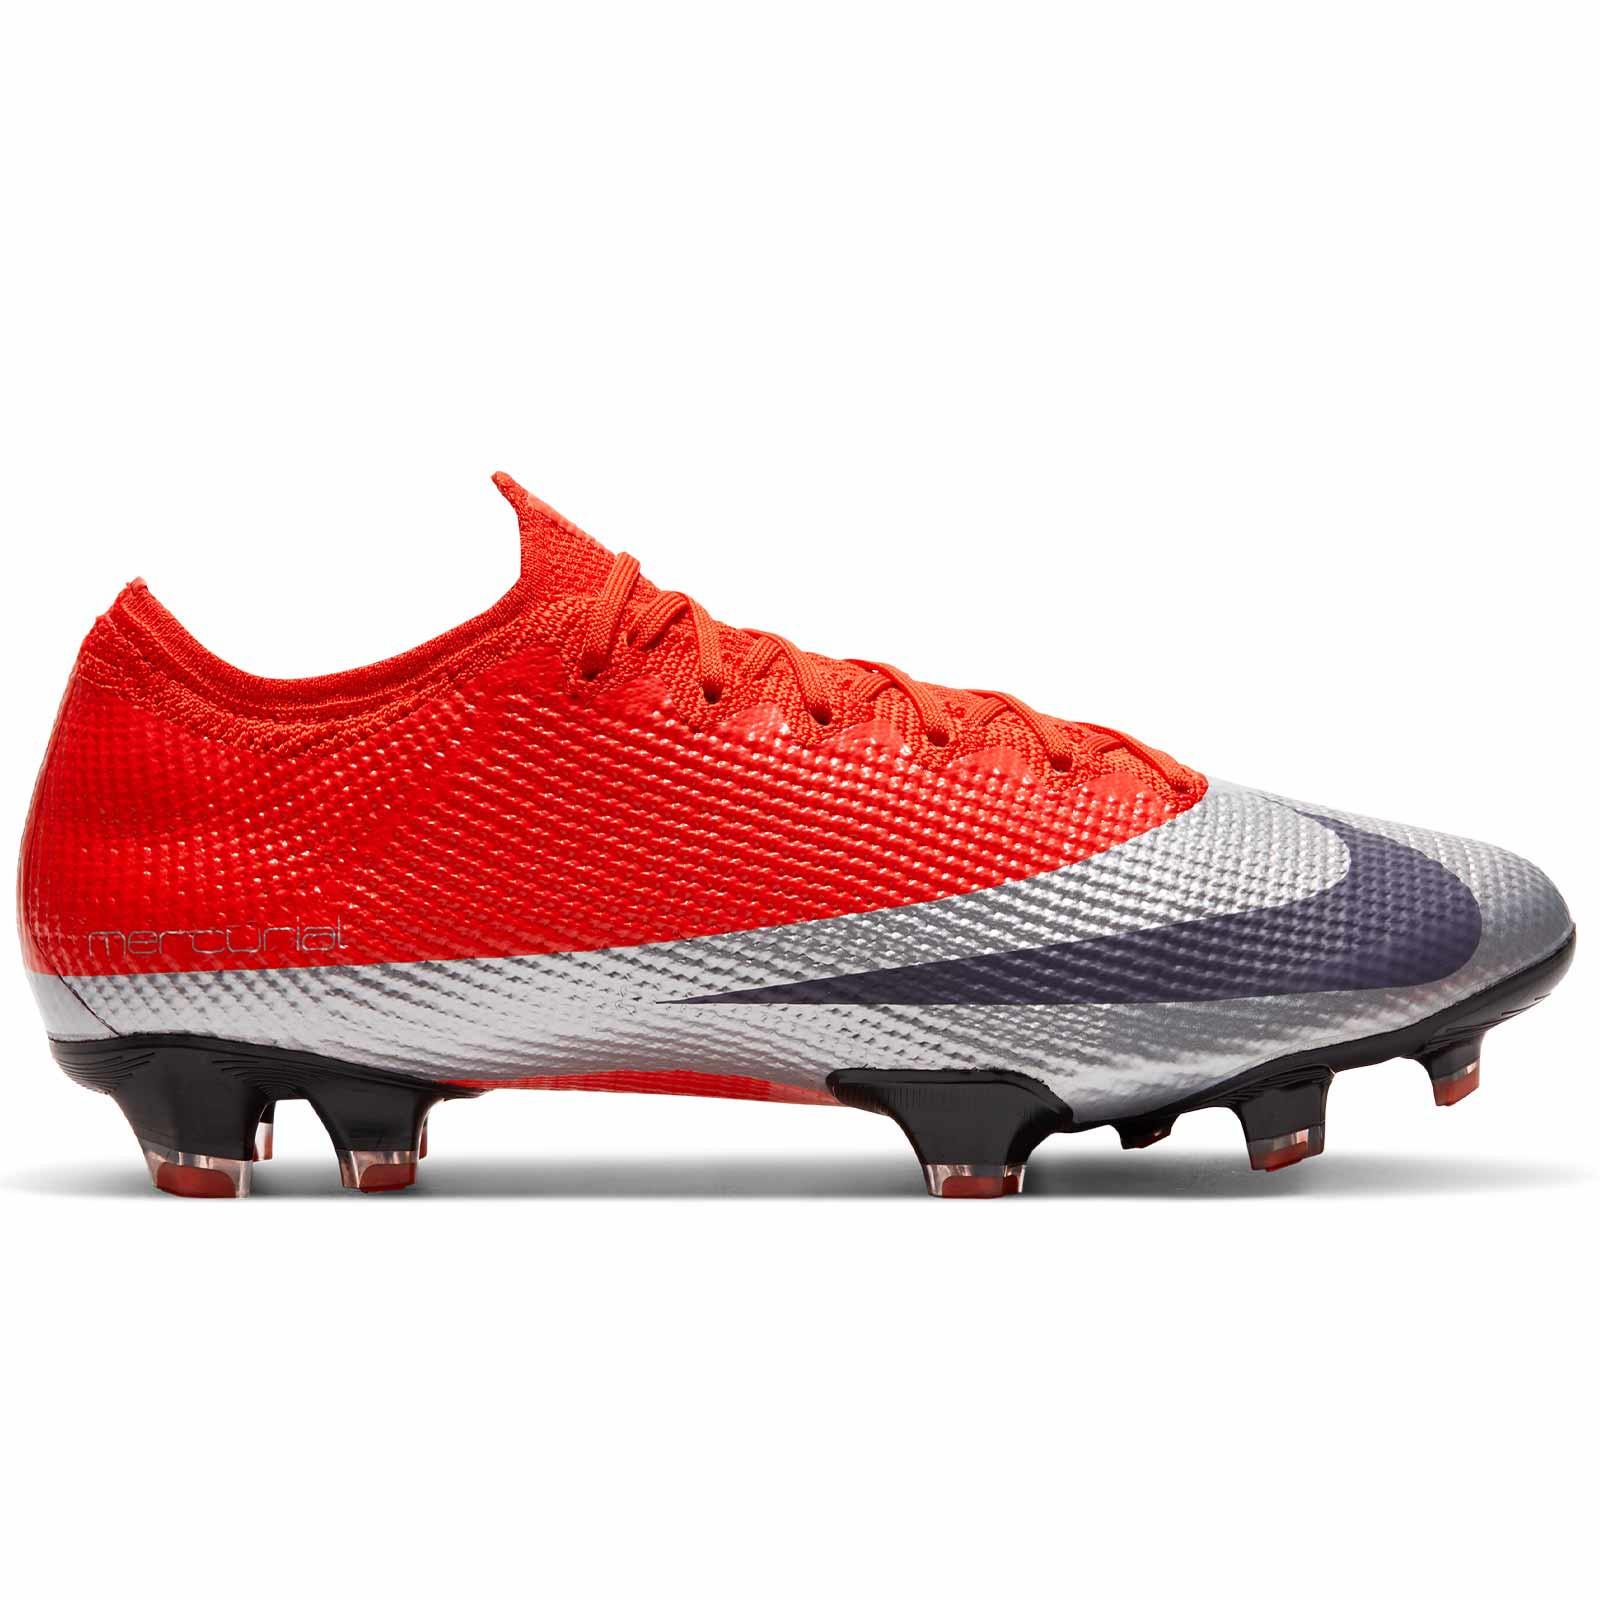 En expansión Hipócrita Halar  Nike Mercurial Vapor 13 Elite FG naranja plata futbolmania